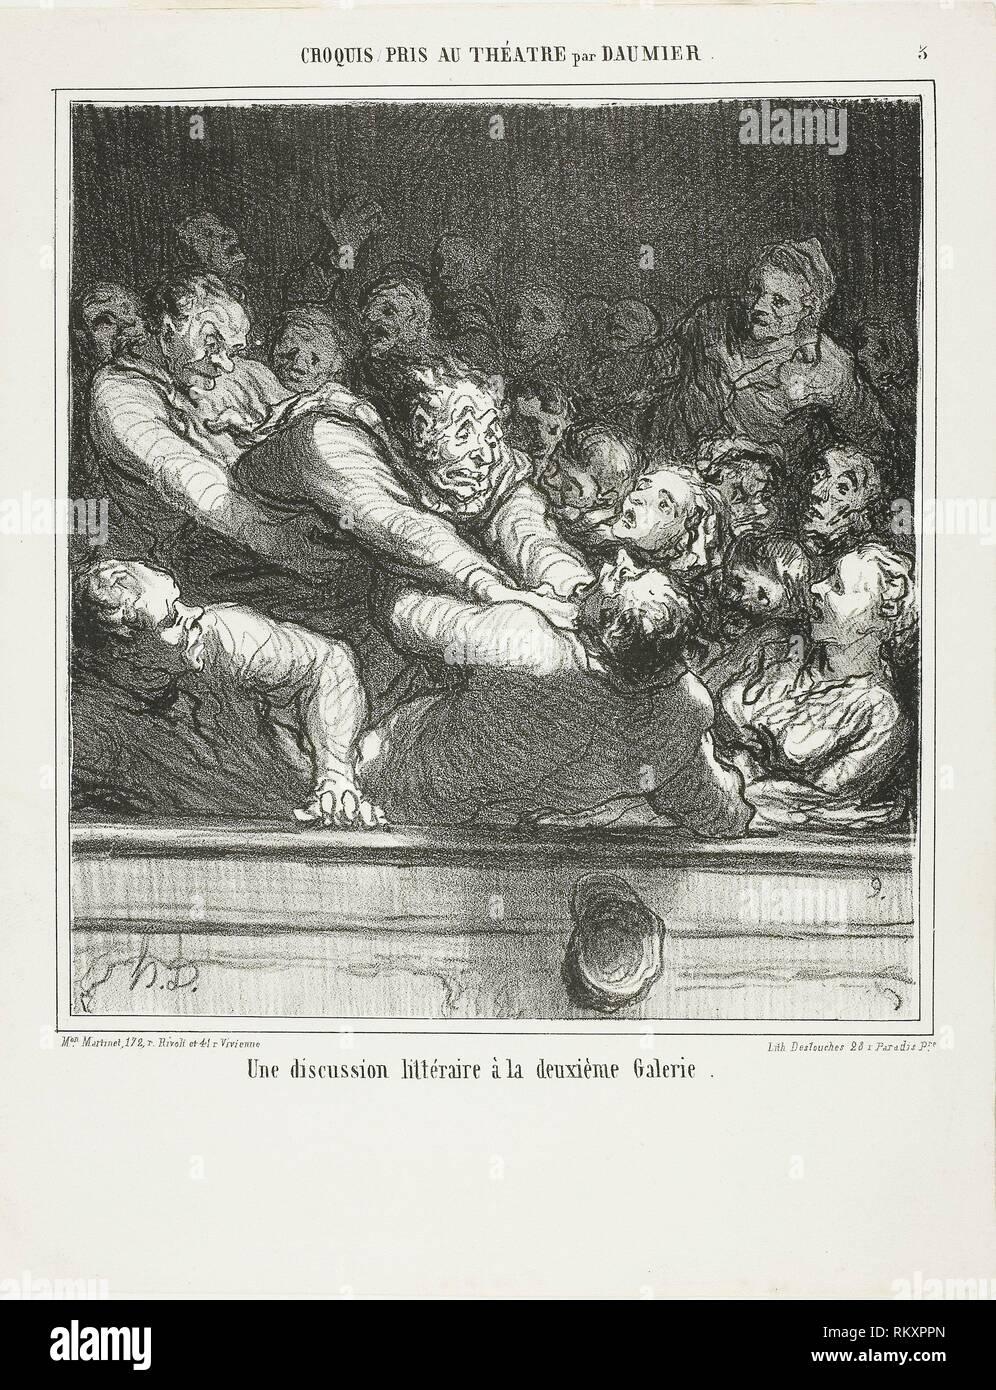 A literary argument on the second tier, plate 3 from Croquis Pris Au Théatre par Daumier - published February 27, 1864 - Honoré Victorin Daumier - Stock Image